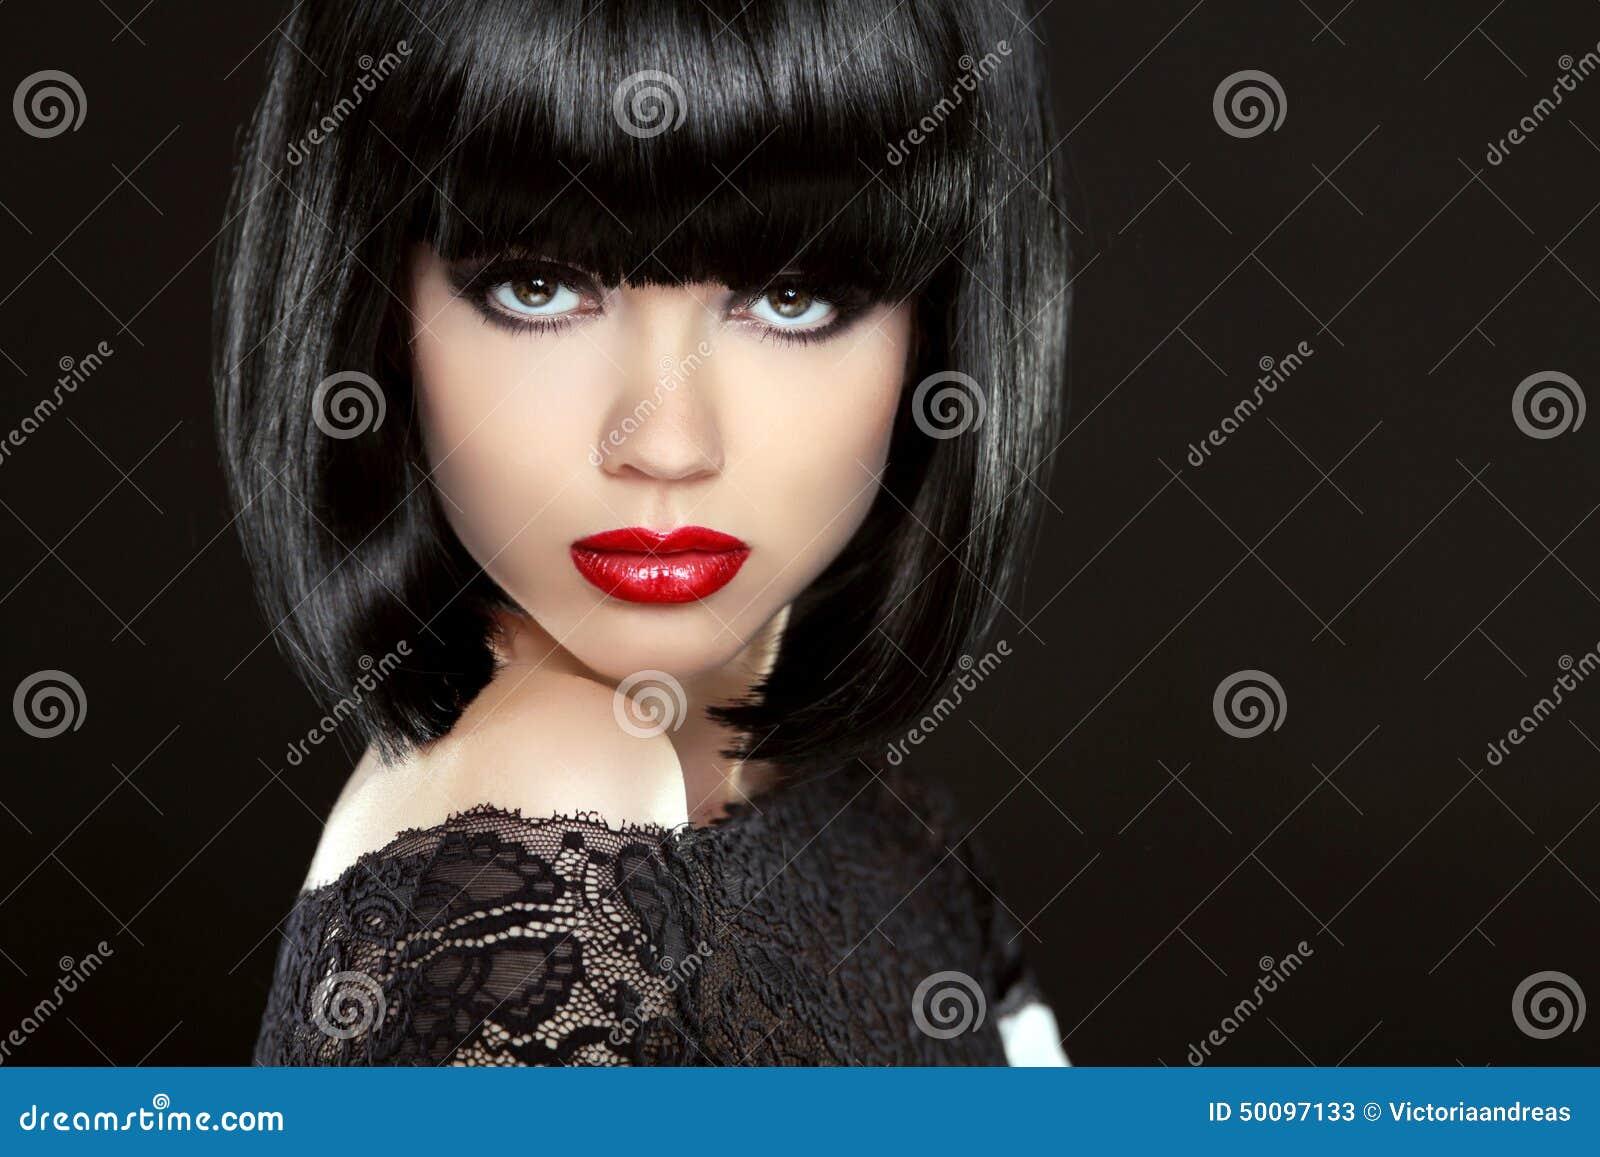 belle femme avec les cheveux courts noirs coupe coiffure fring photo stock image 50097133. Black Bedroom Furniture Sets. Home Design Ideas